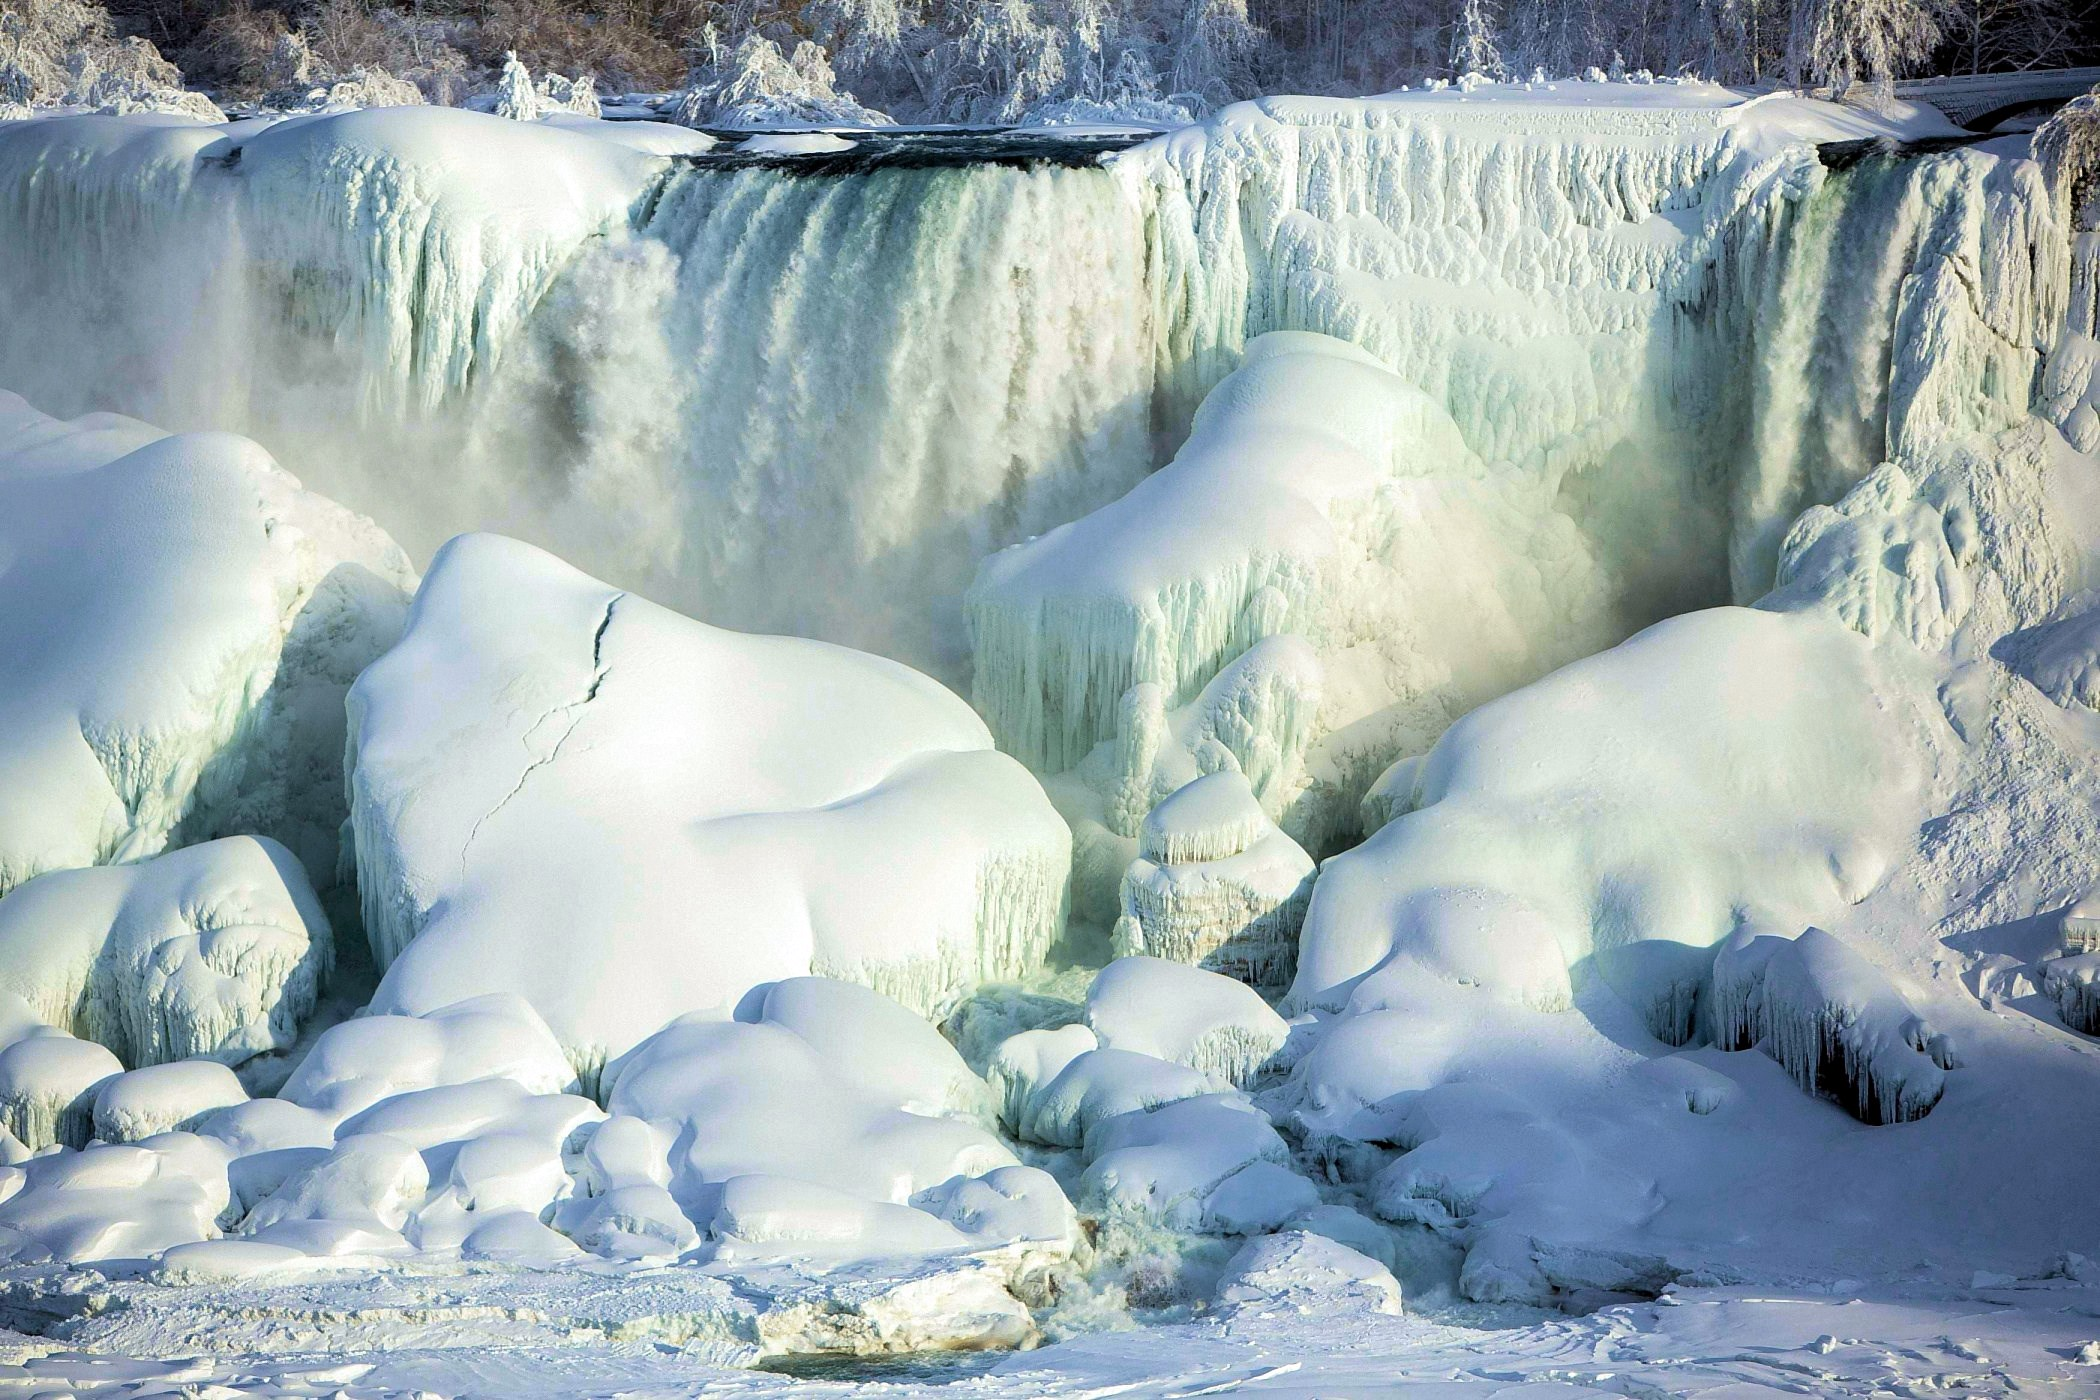 Map of the Niagara Falls Region